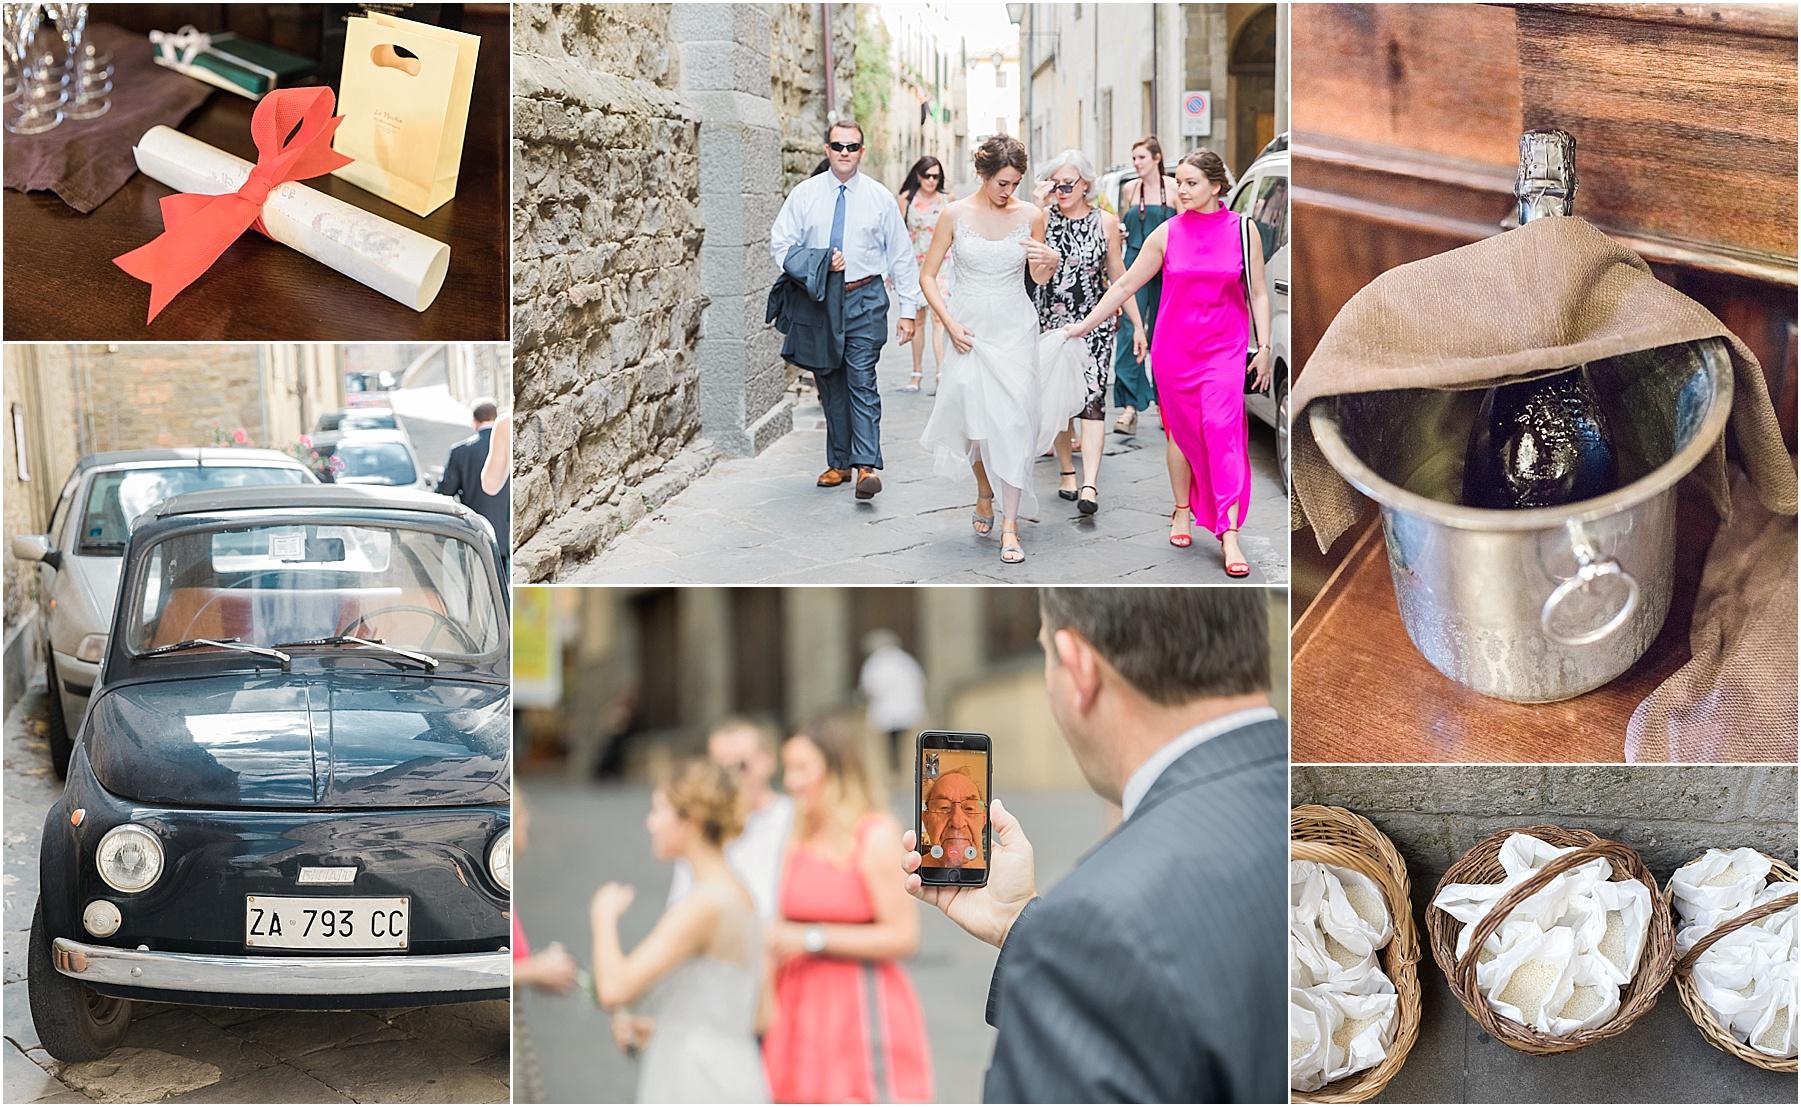 destination wedding italy tuscany cortona walking to the ceremony fiat ceremony details risotto to throw